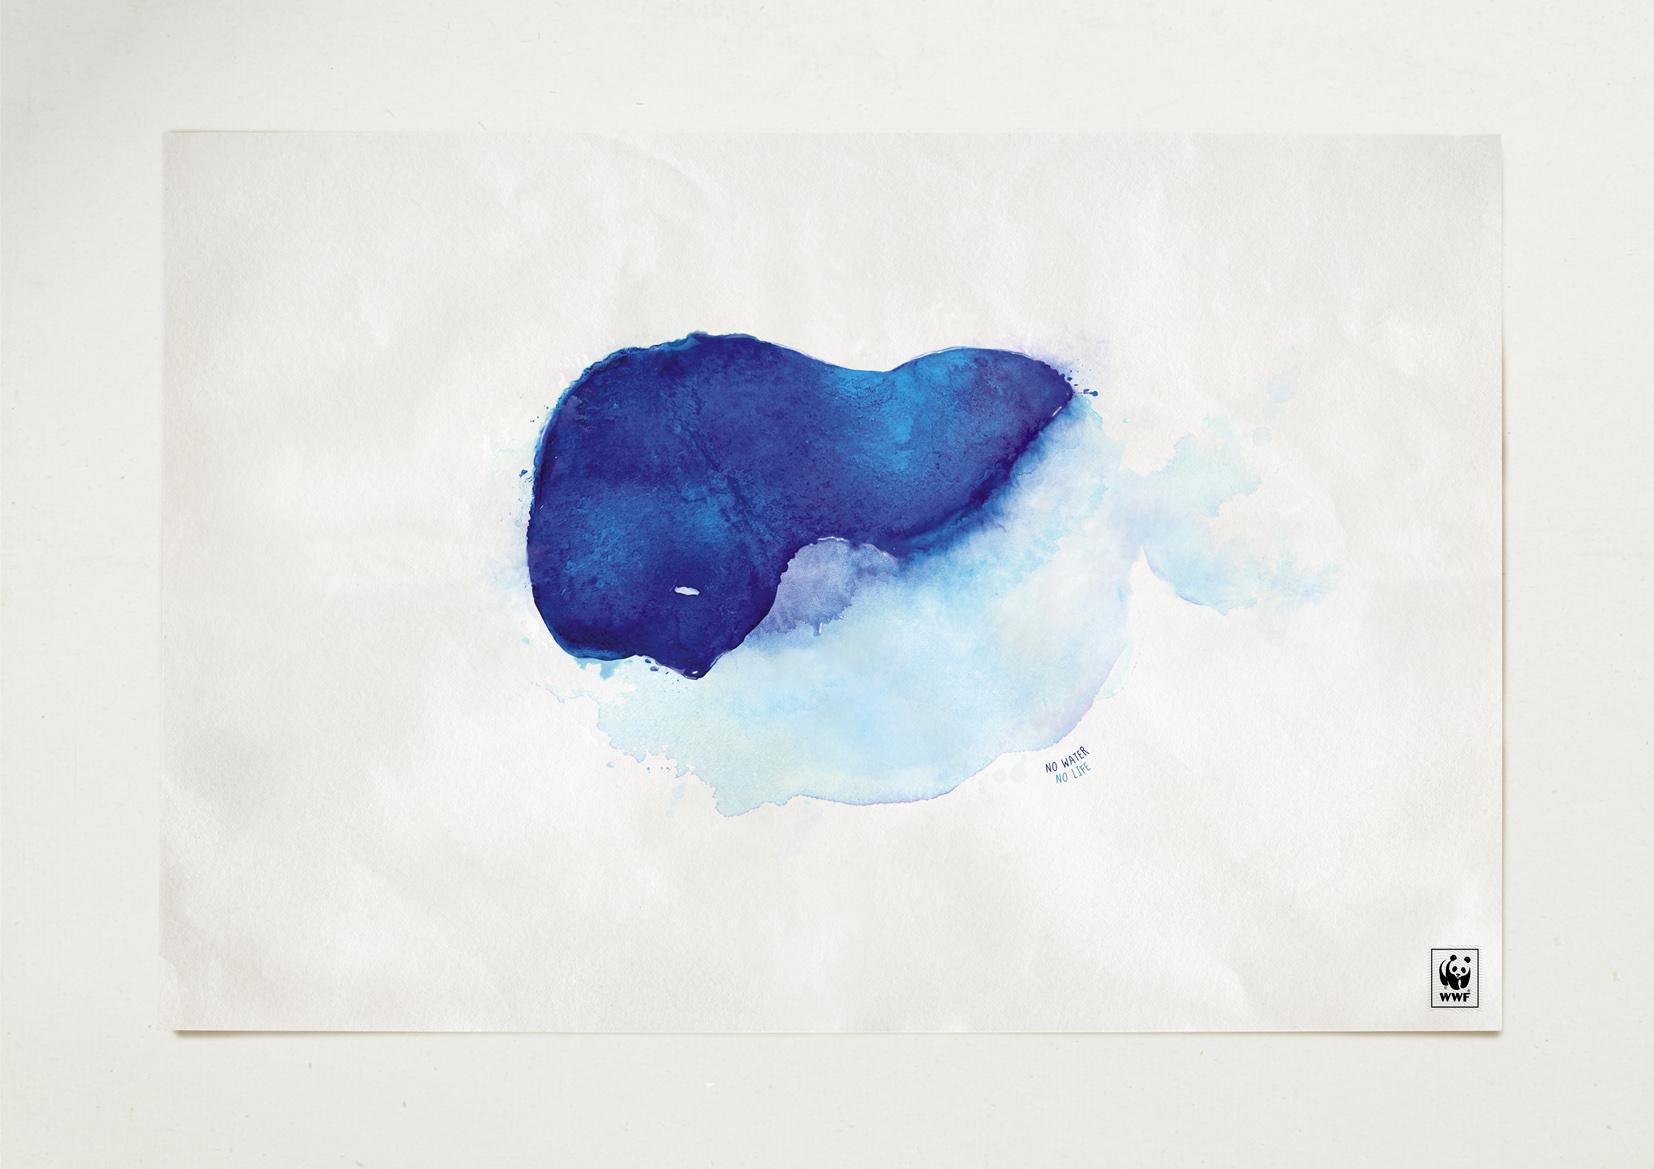 WWF Print Ad -  Whale